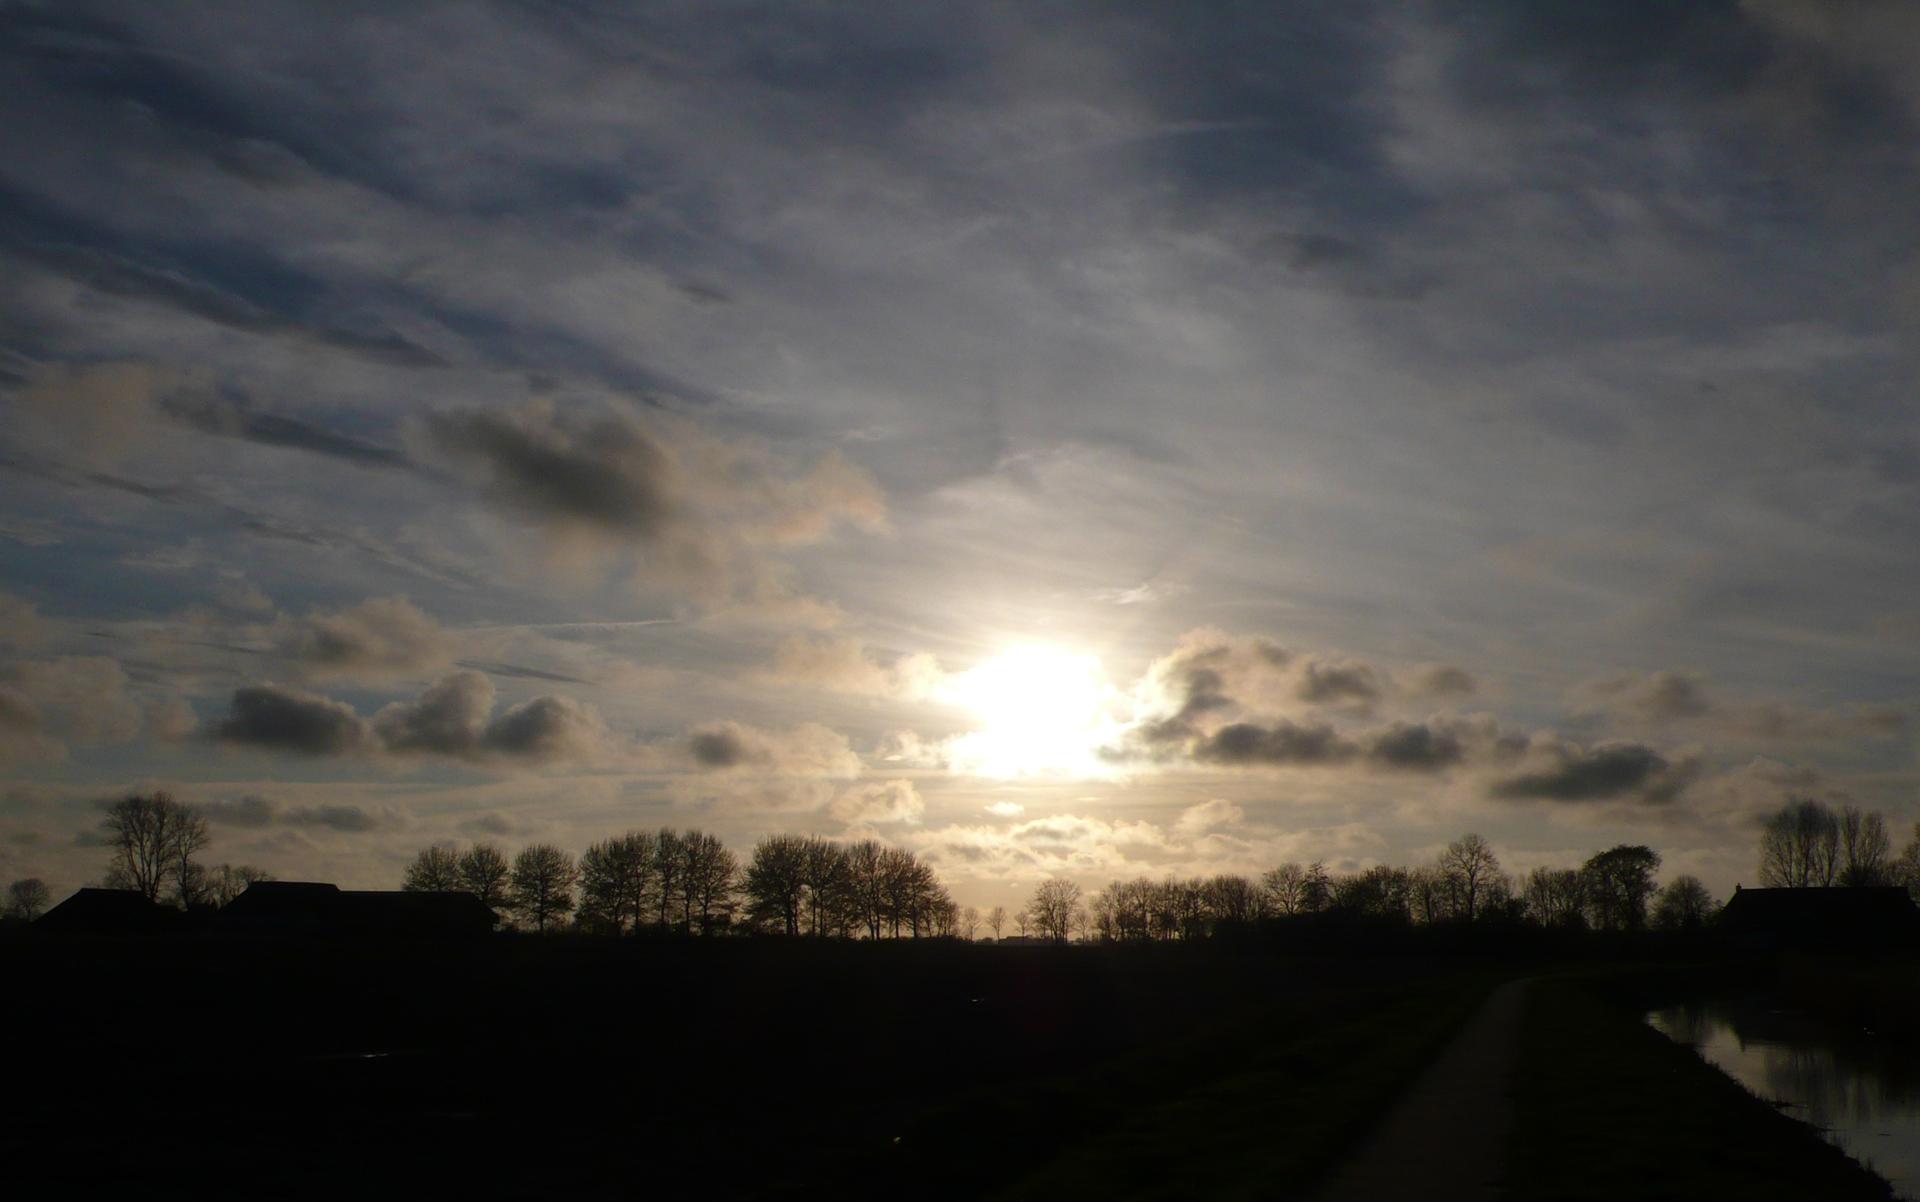 De Horizon Molenrij dark sky 1